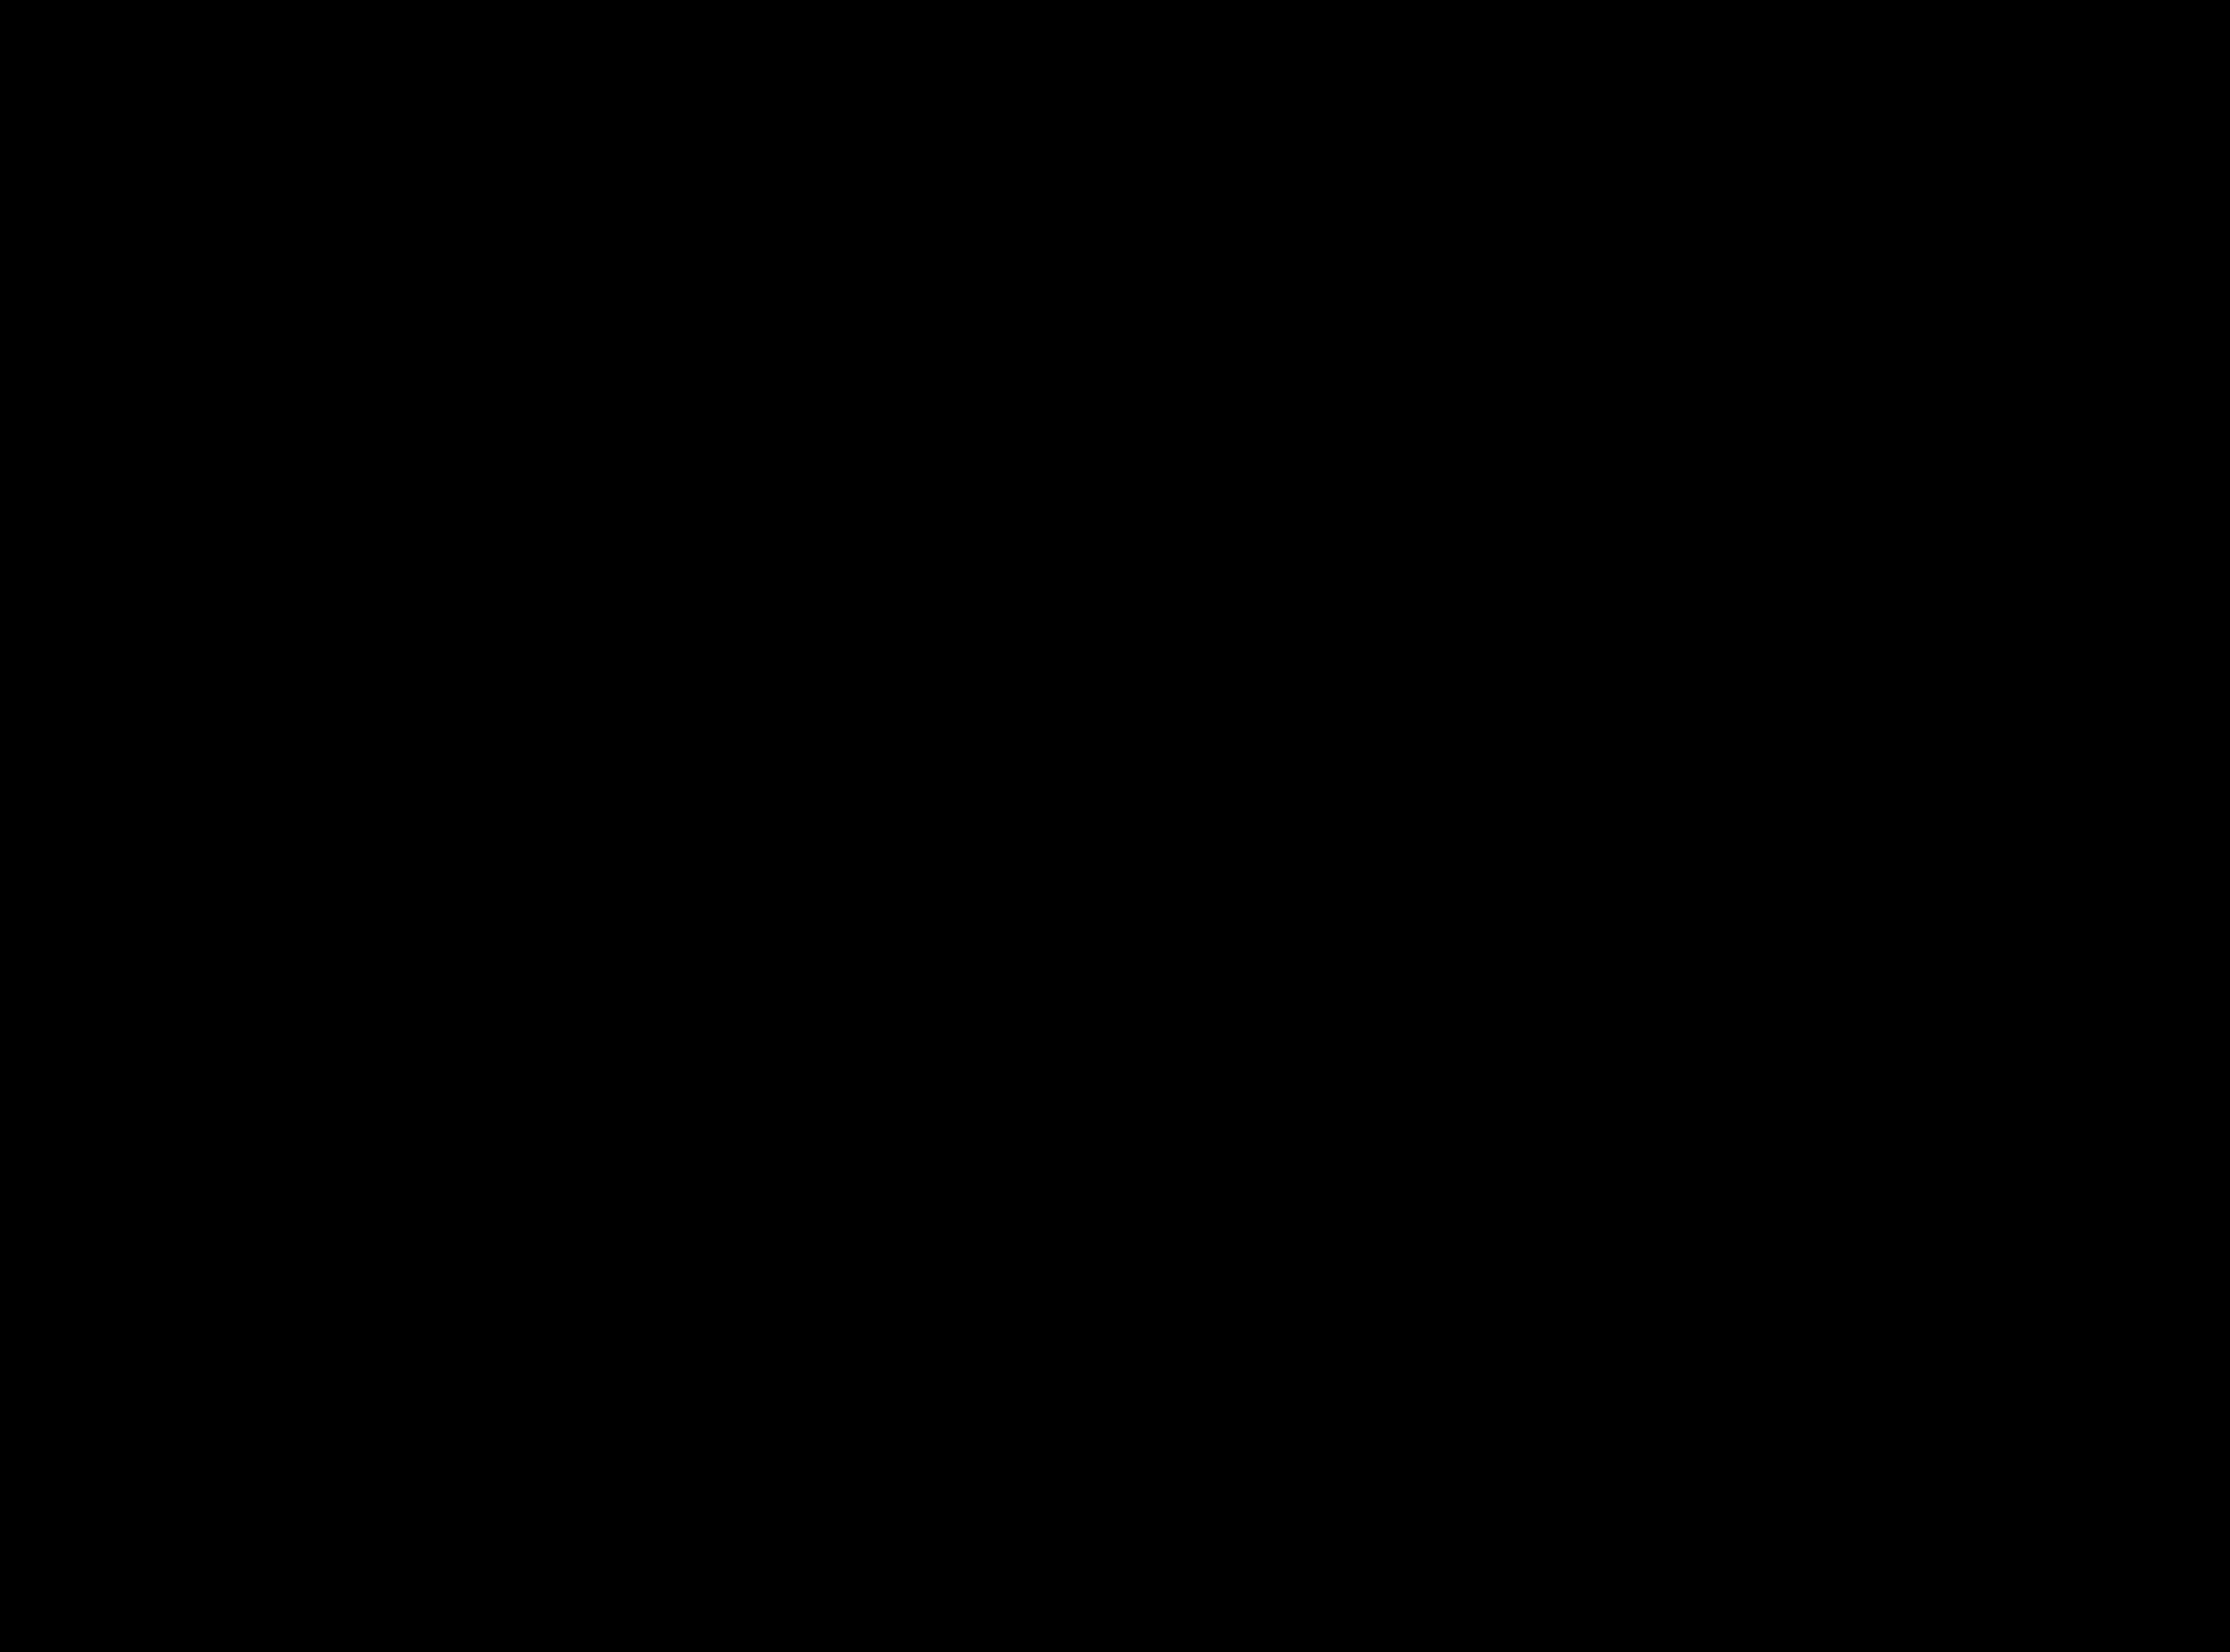 Koerber Supply Chain AU Pty Ltd